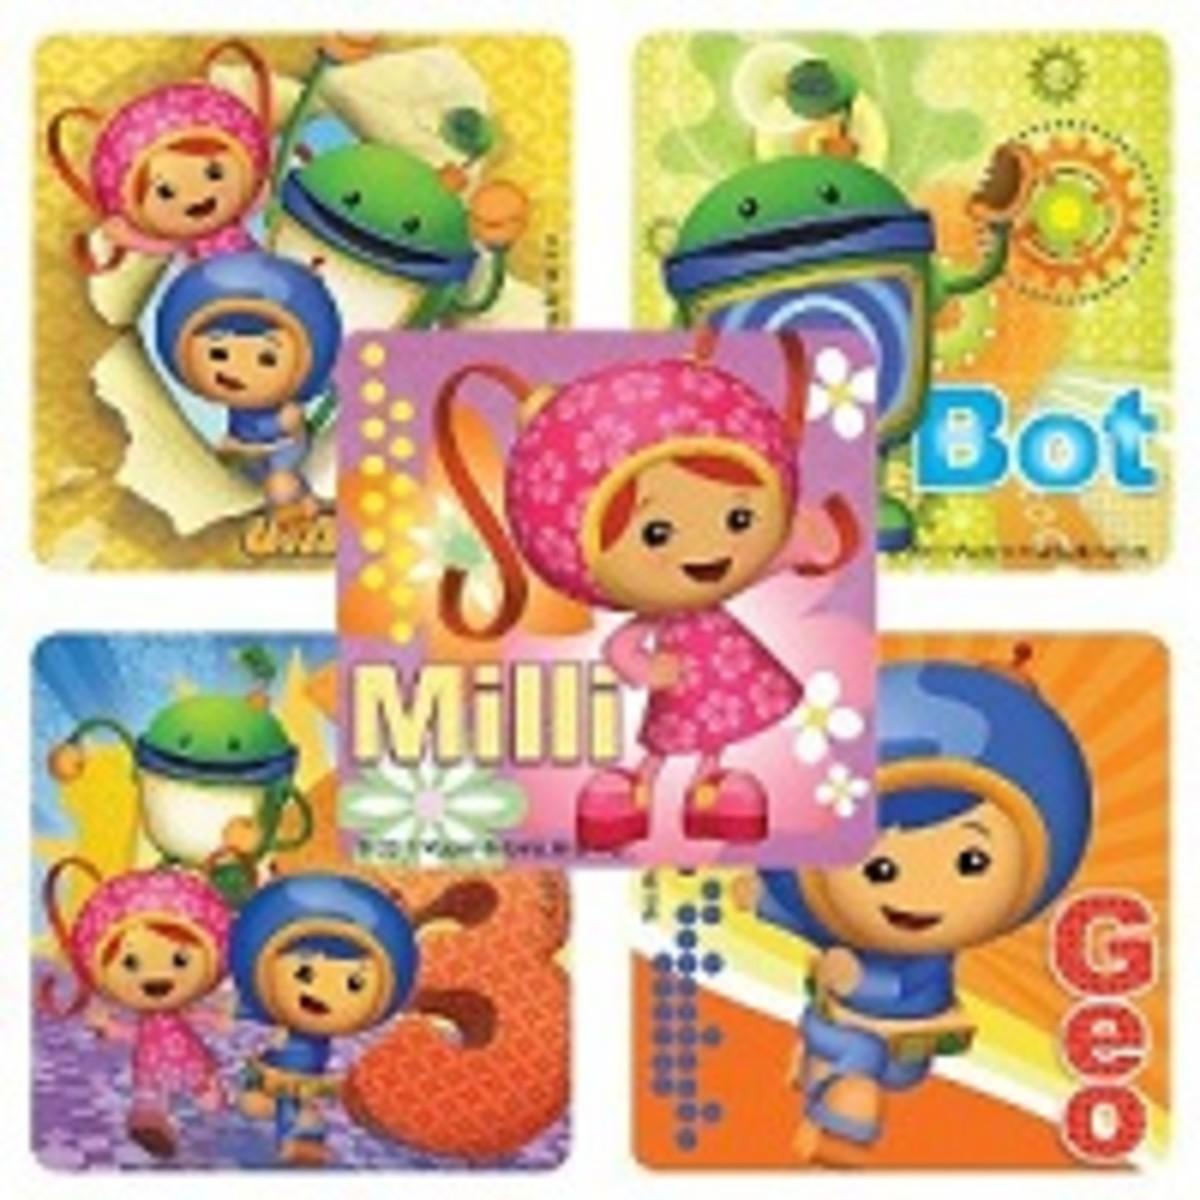 Team umizoomi stickers